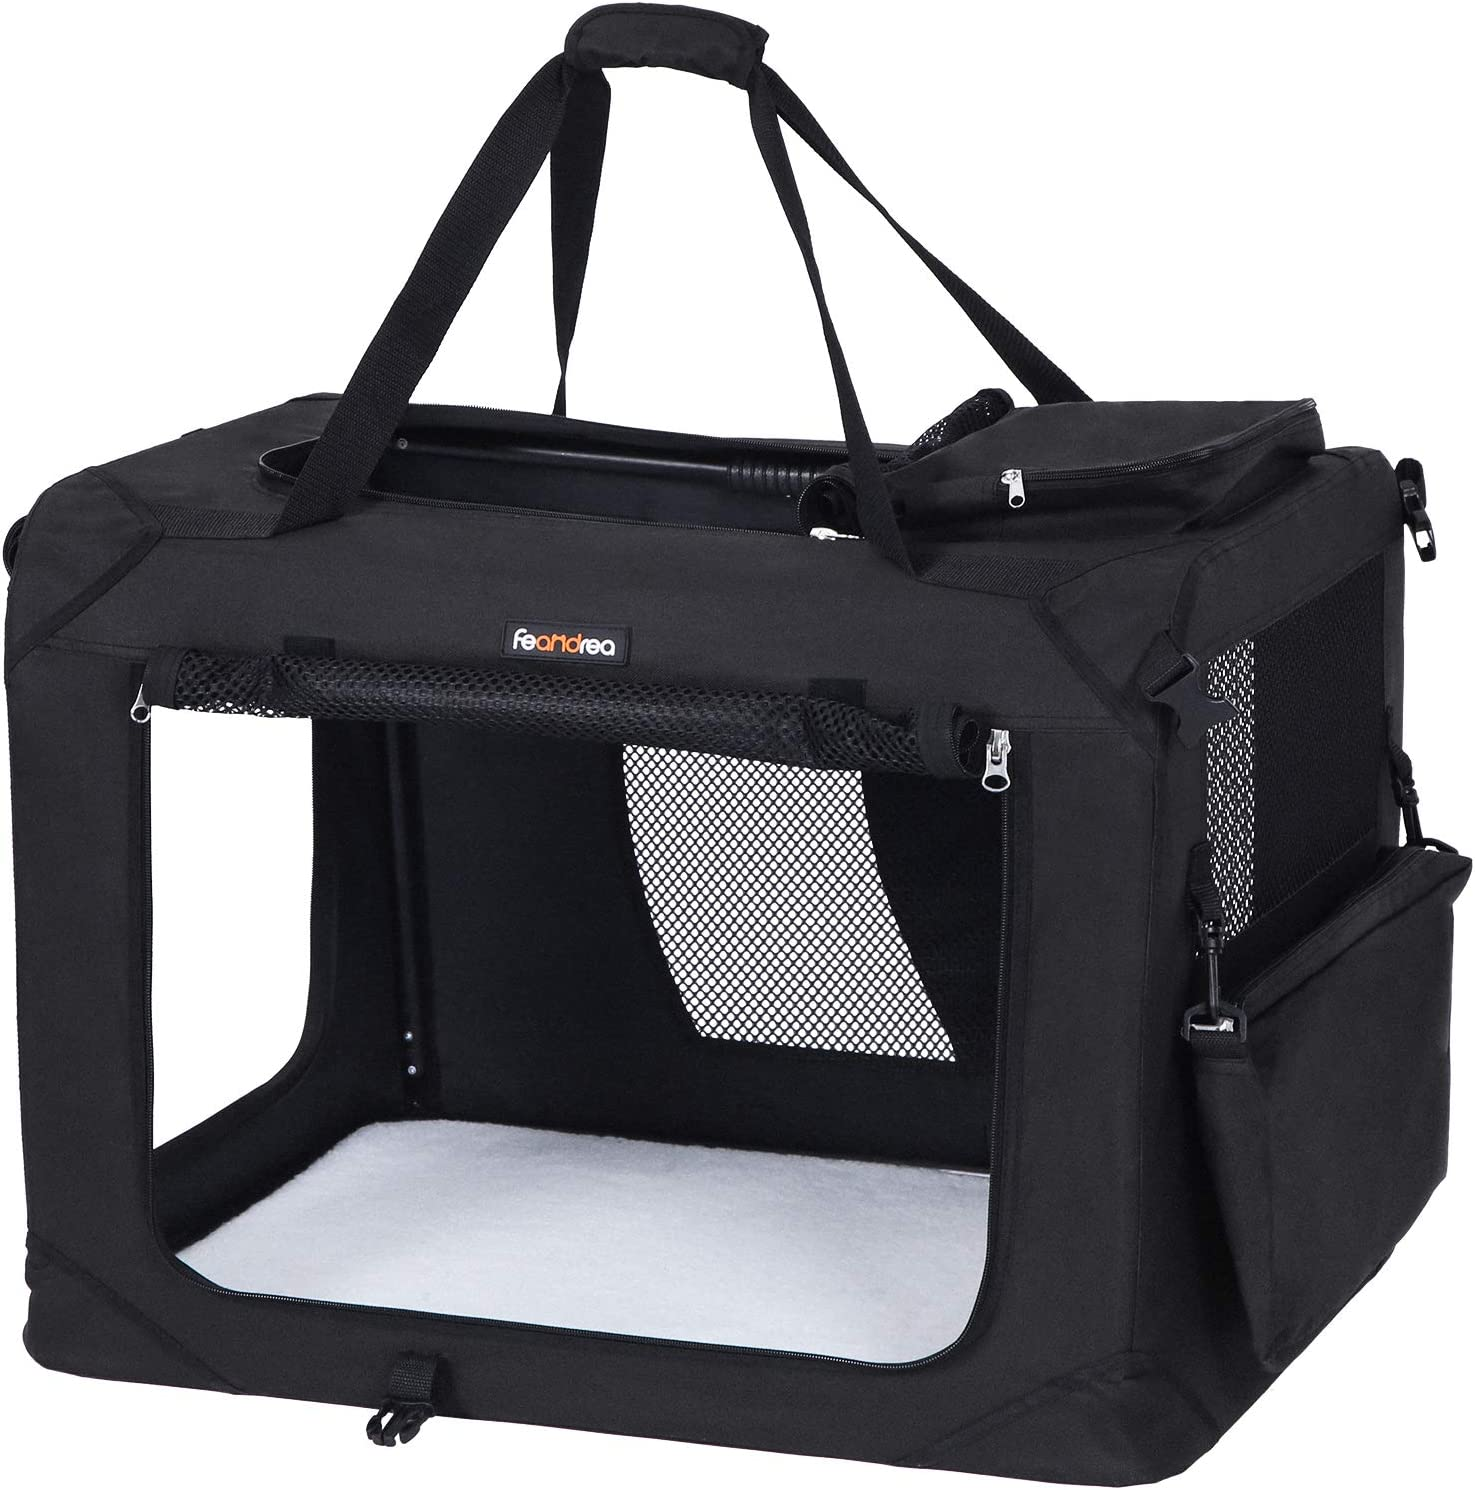 FEANDREA Bolsa de Transporte para Mascotas Transportín Plegable para Perro Portador Tela Oxford Negro L 70 x 52 x 52 cm PDC70H